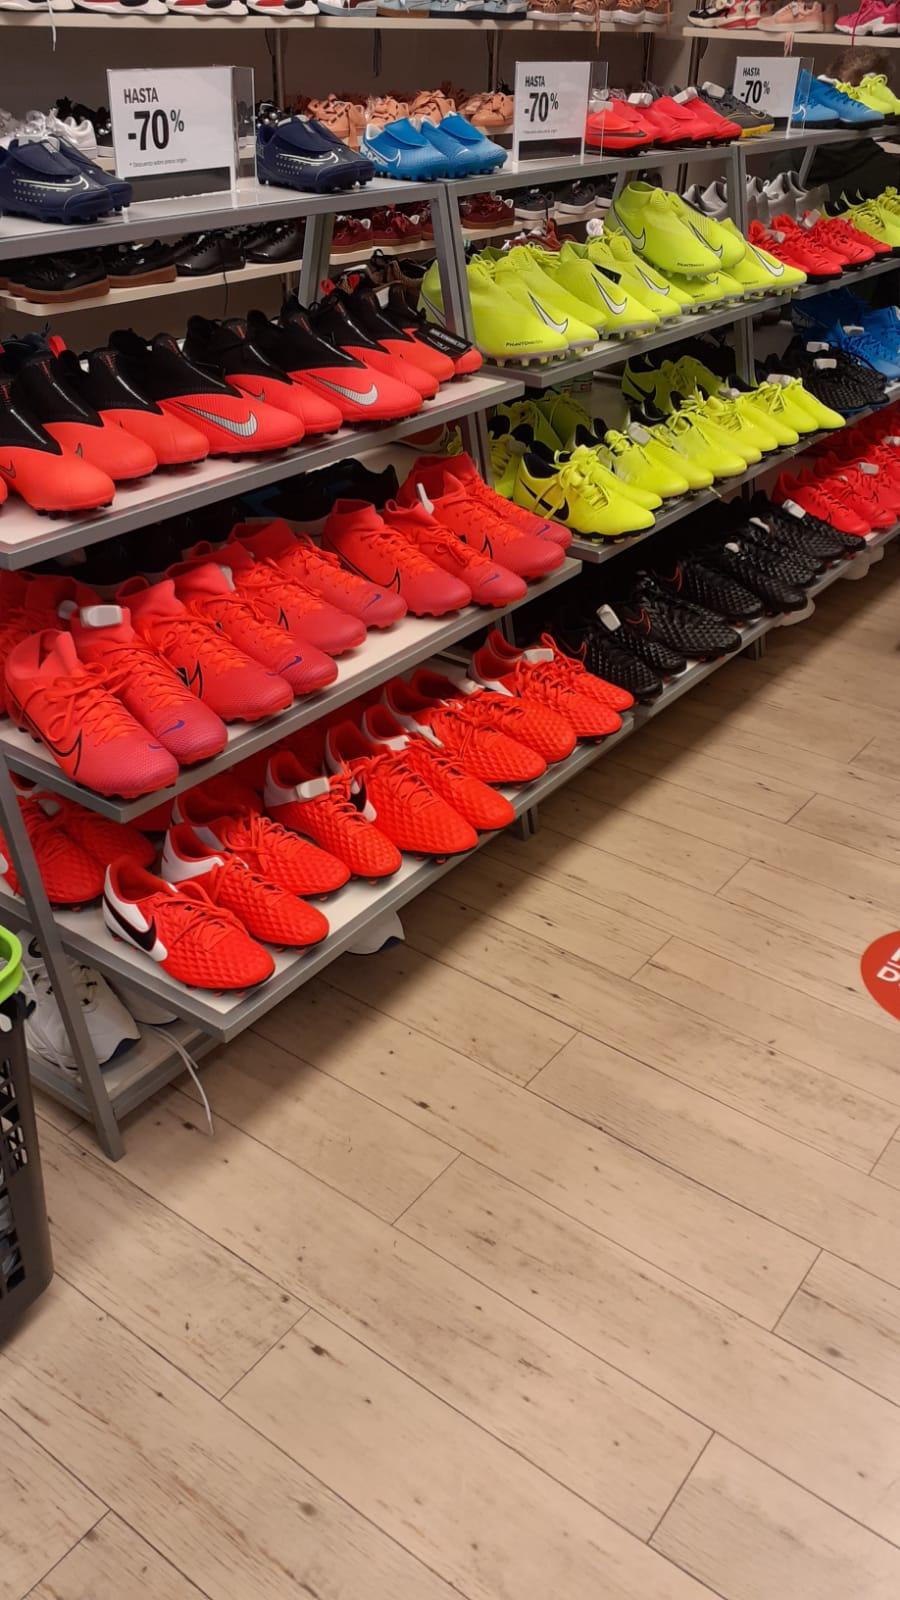 Botas de fútbol Nike 87%descuento en Outlet Corte Inglés Ferrol